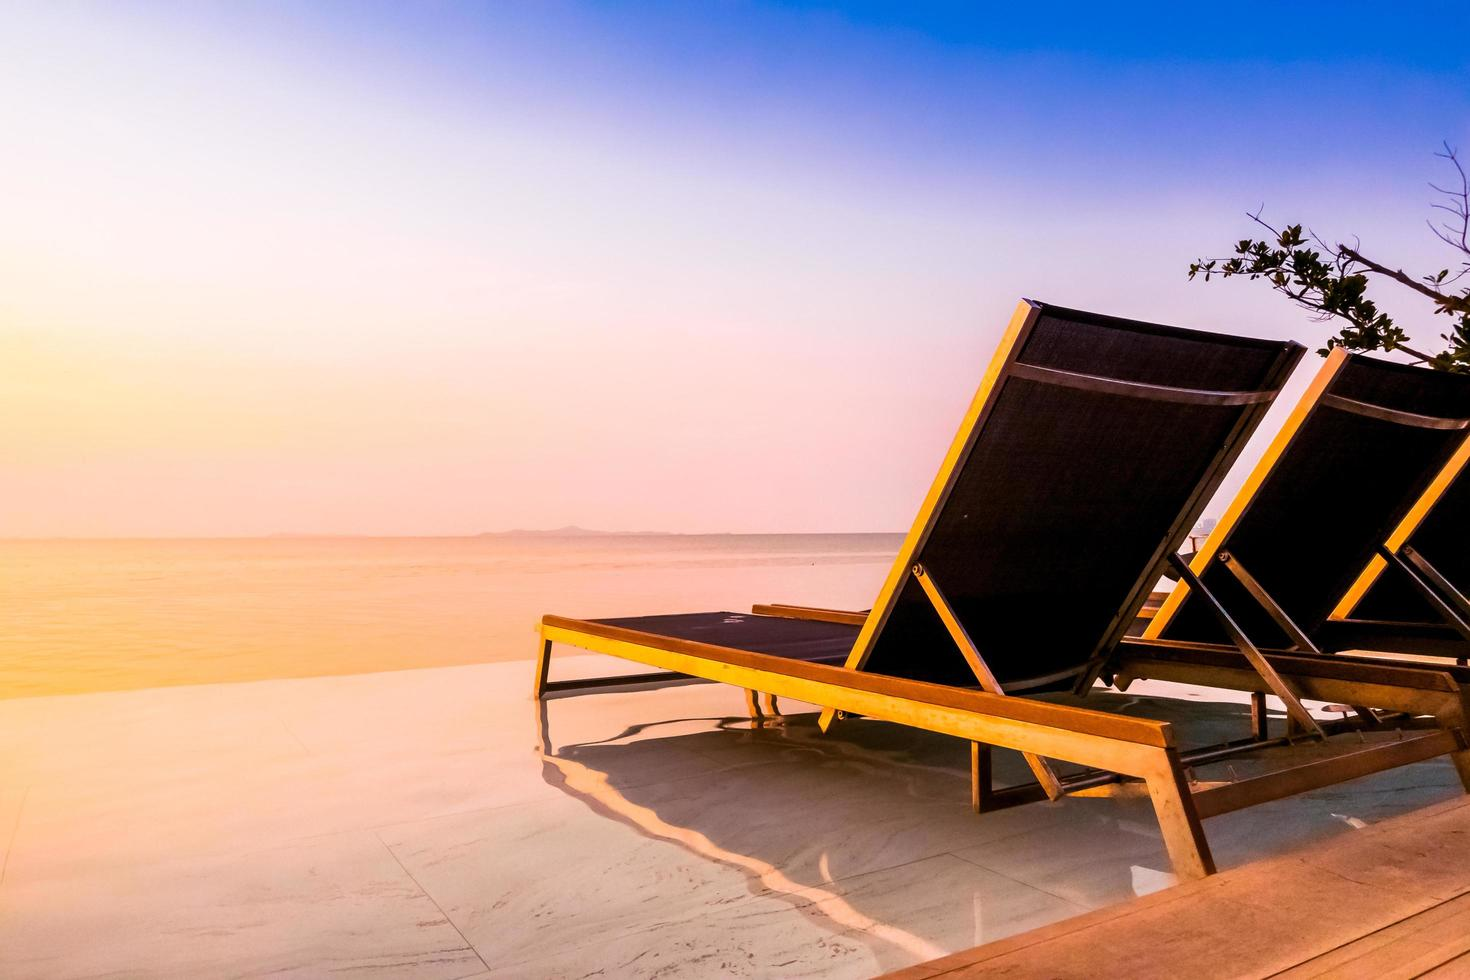 schönes Luxushotel Swimmingpool Resort foto